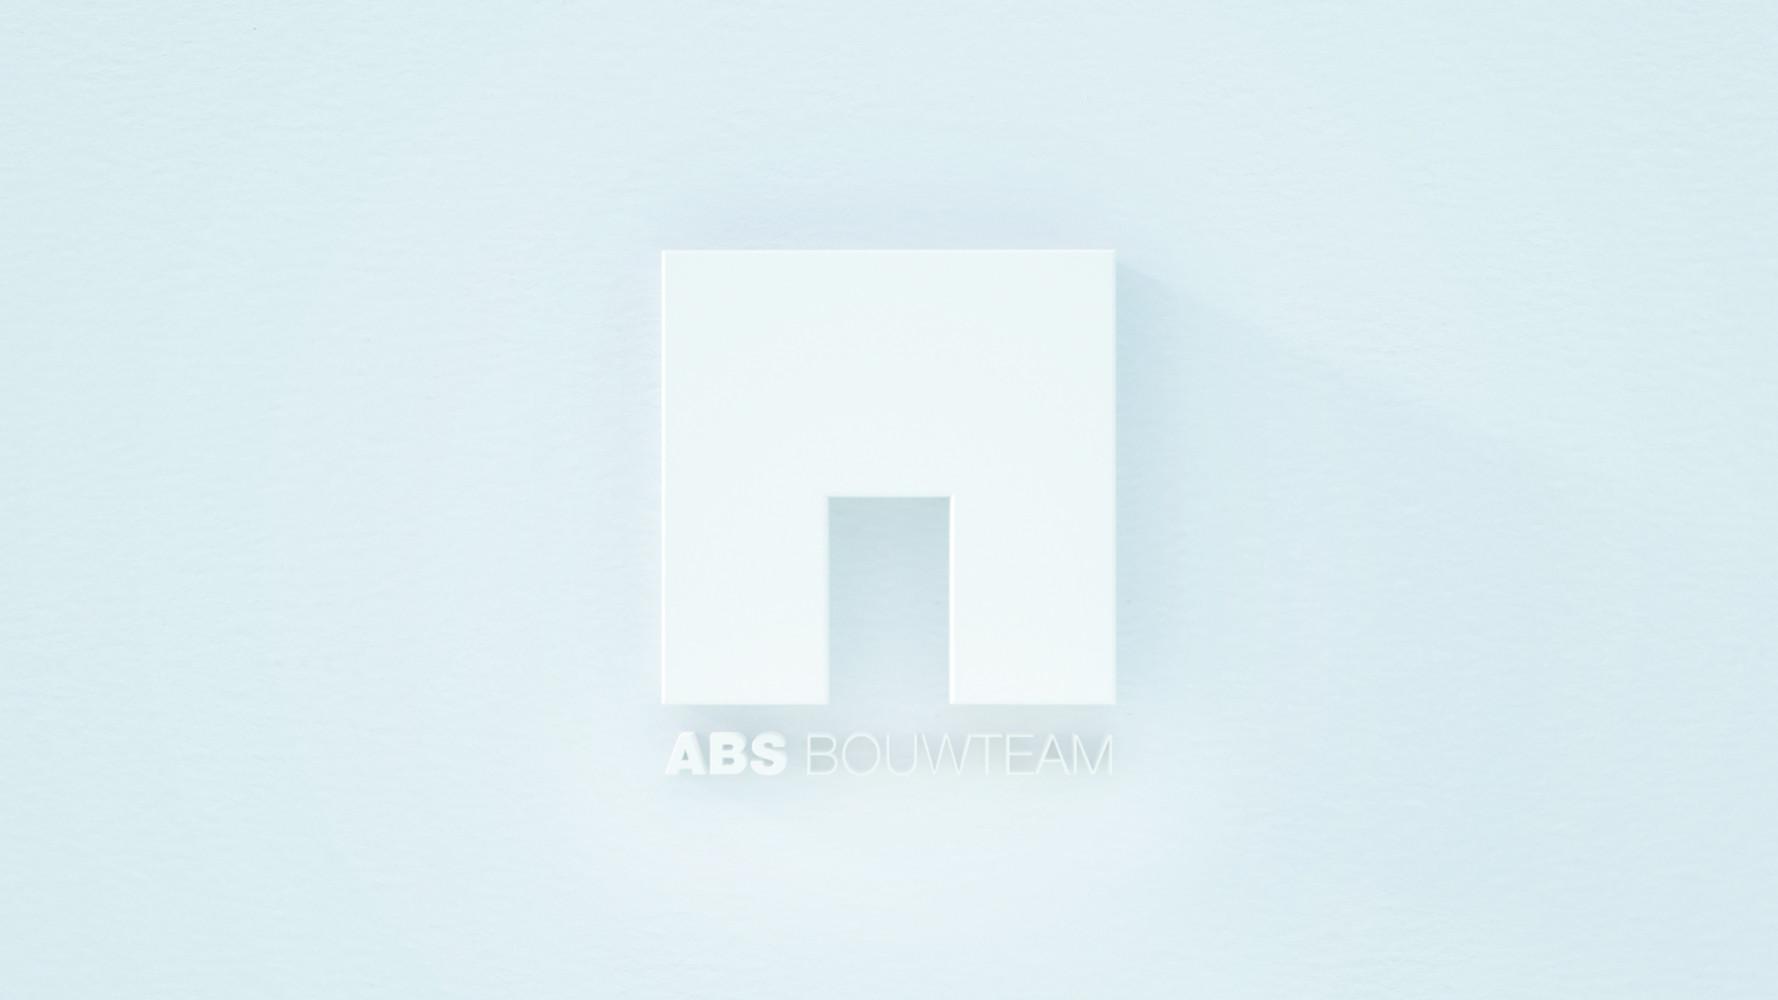 3D logotype